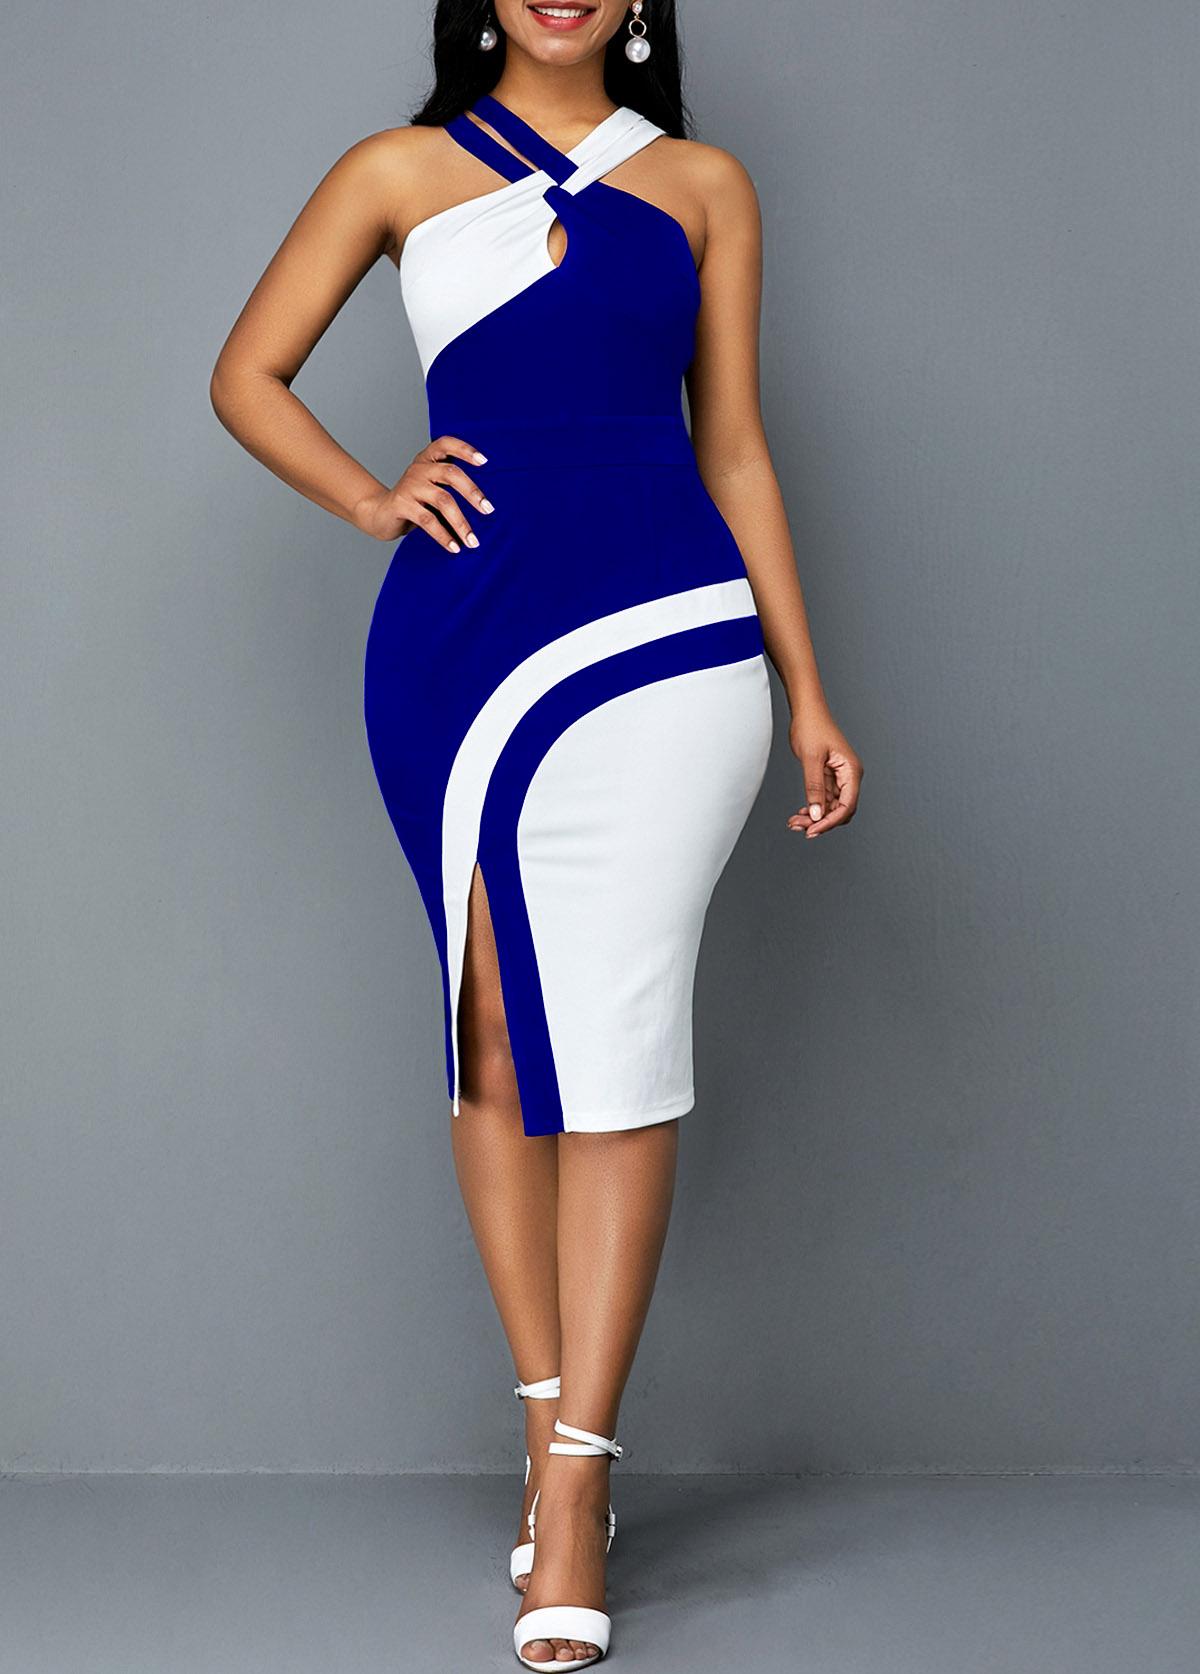 Contrast Sleeveless Side Slit Bodycon Dress